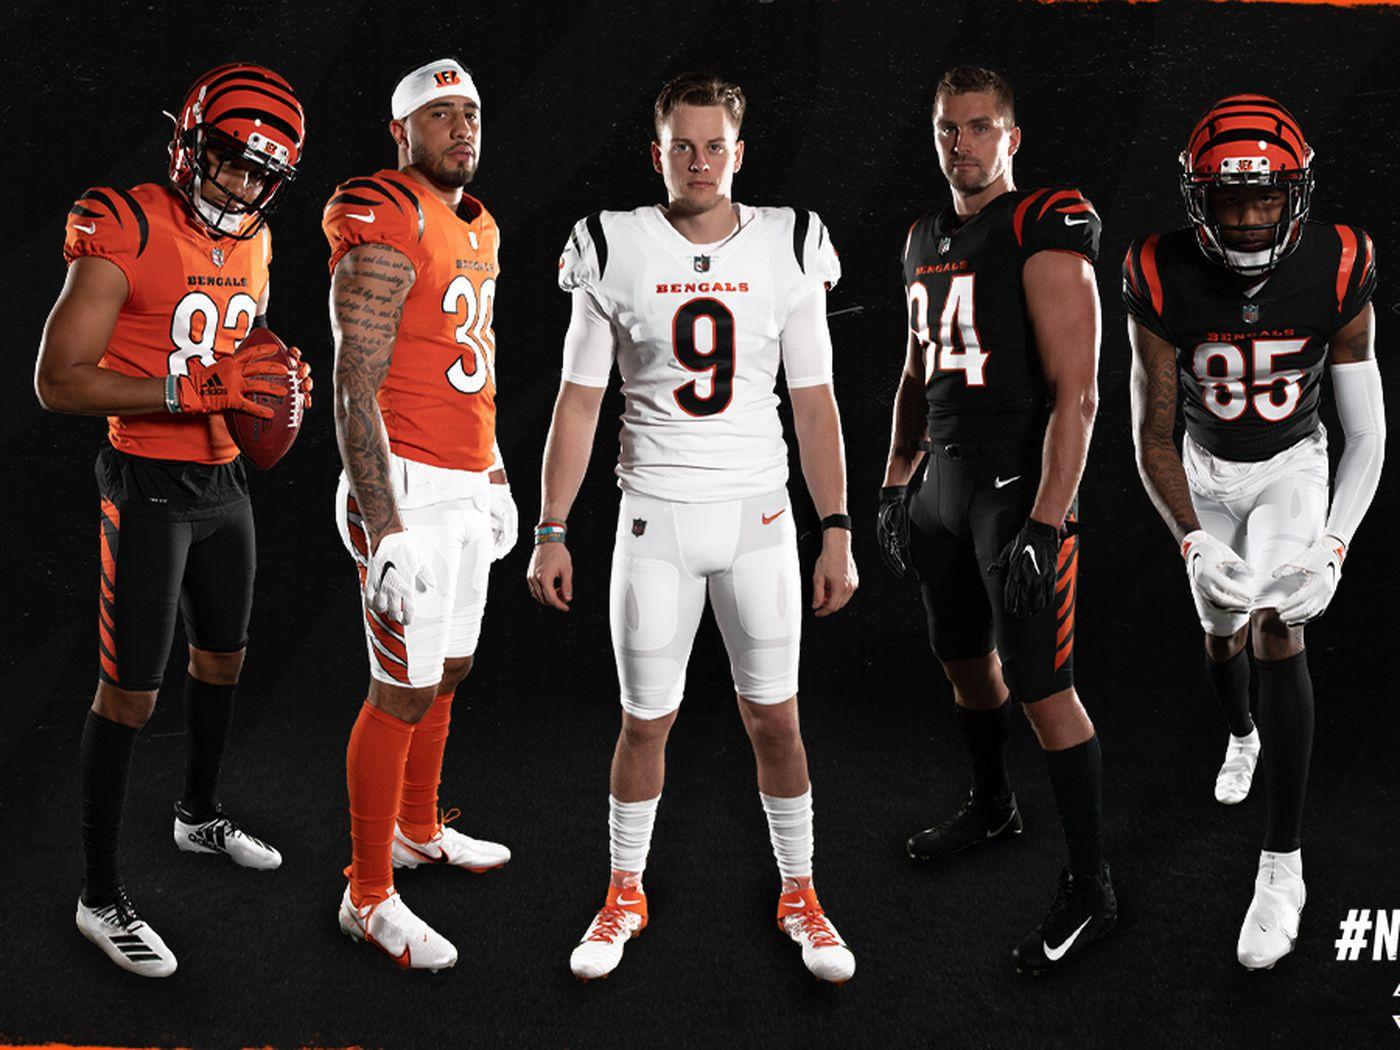 Bengals' new uniforms revealed: NFL news - Cincy Jungle